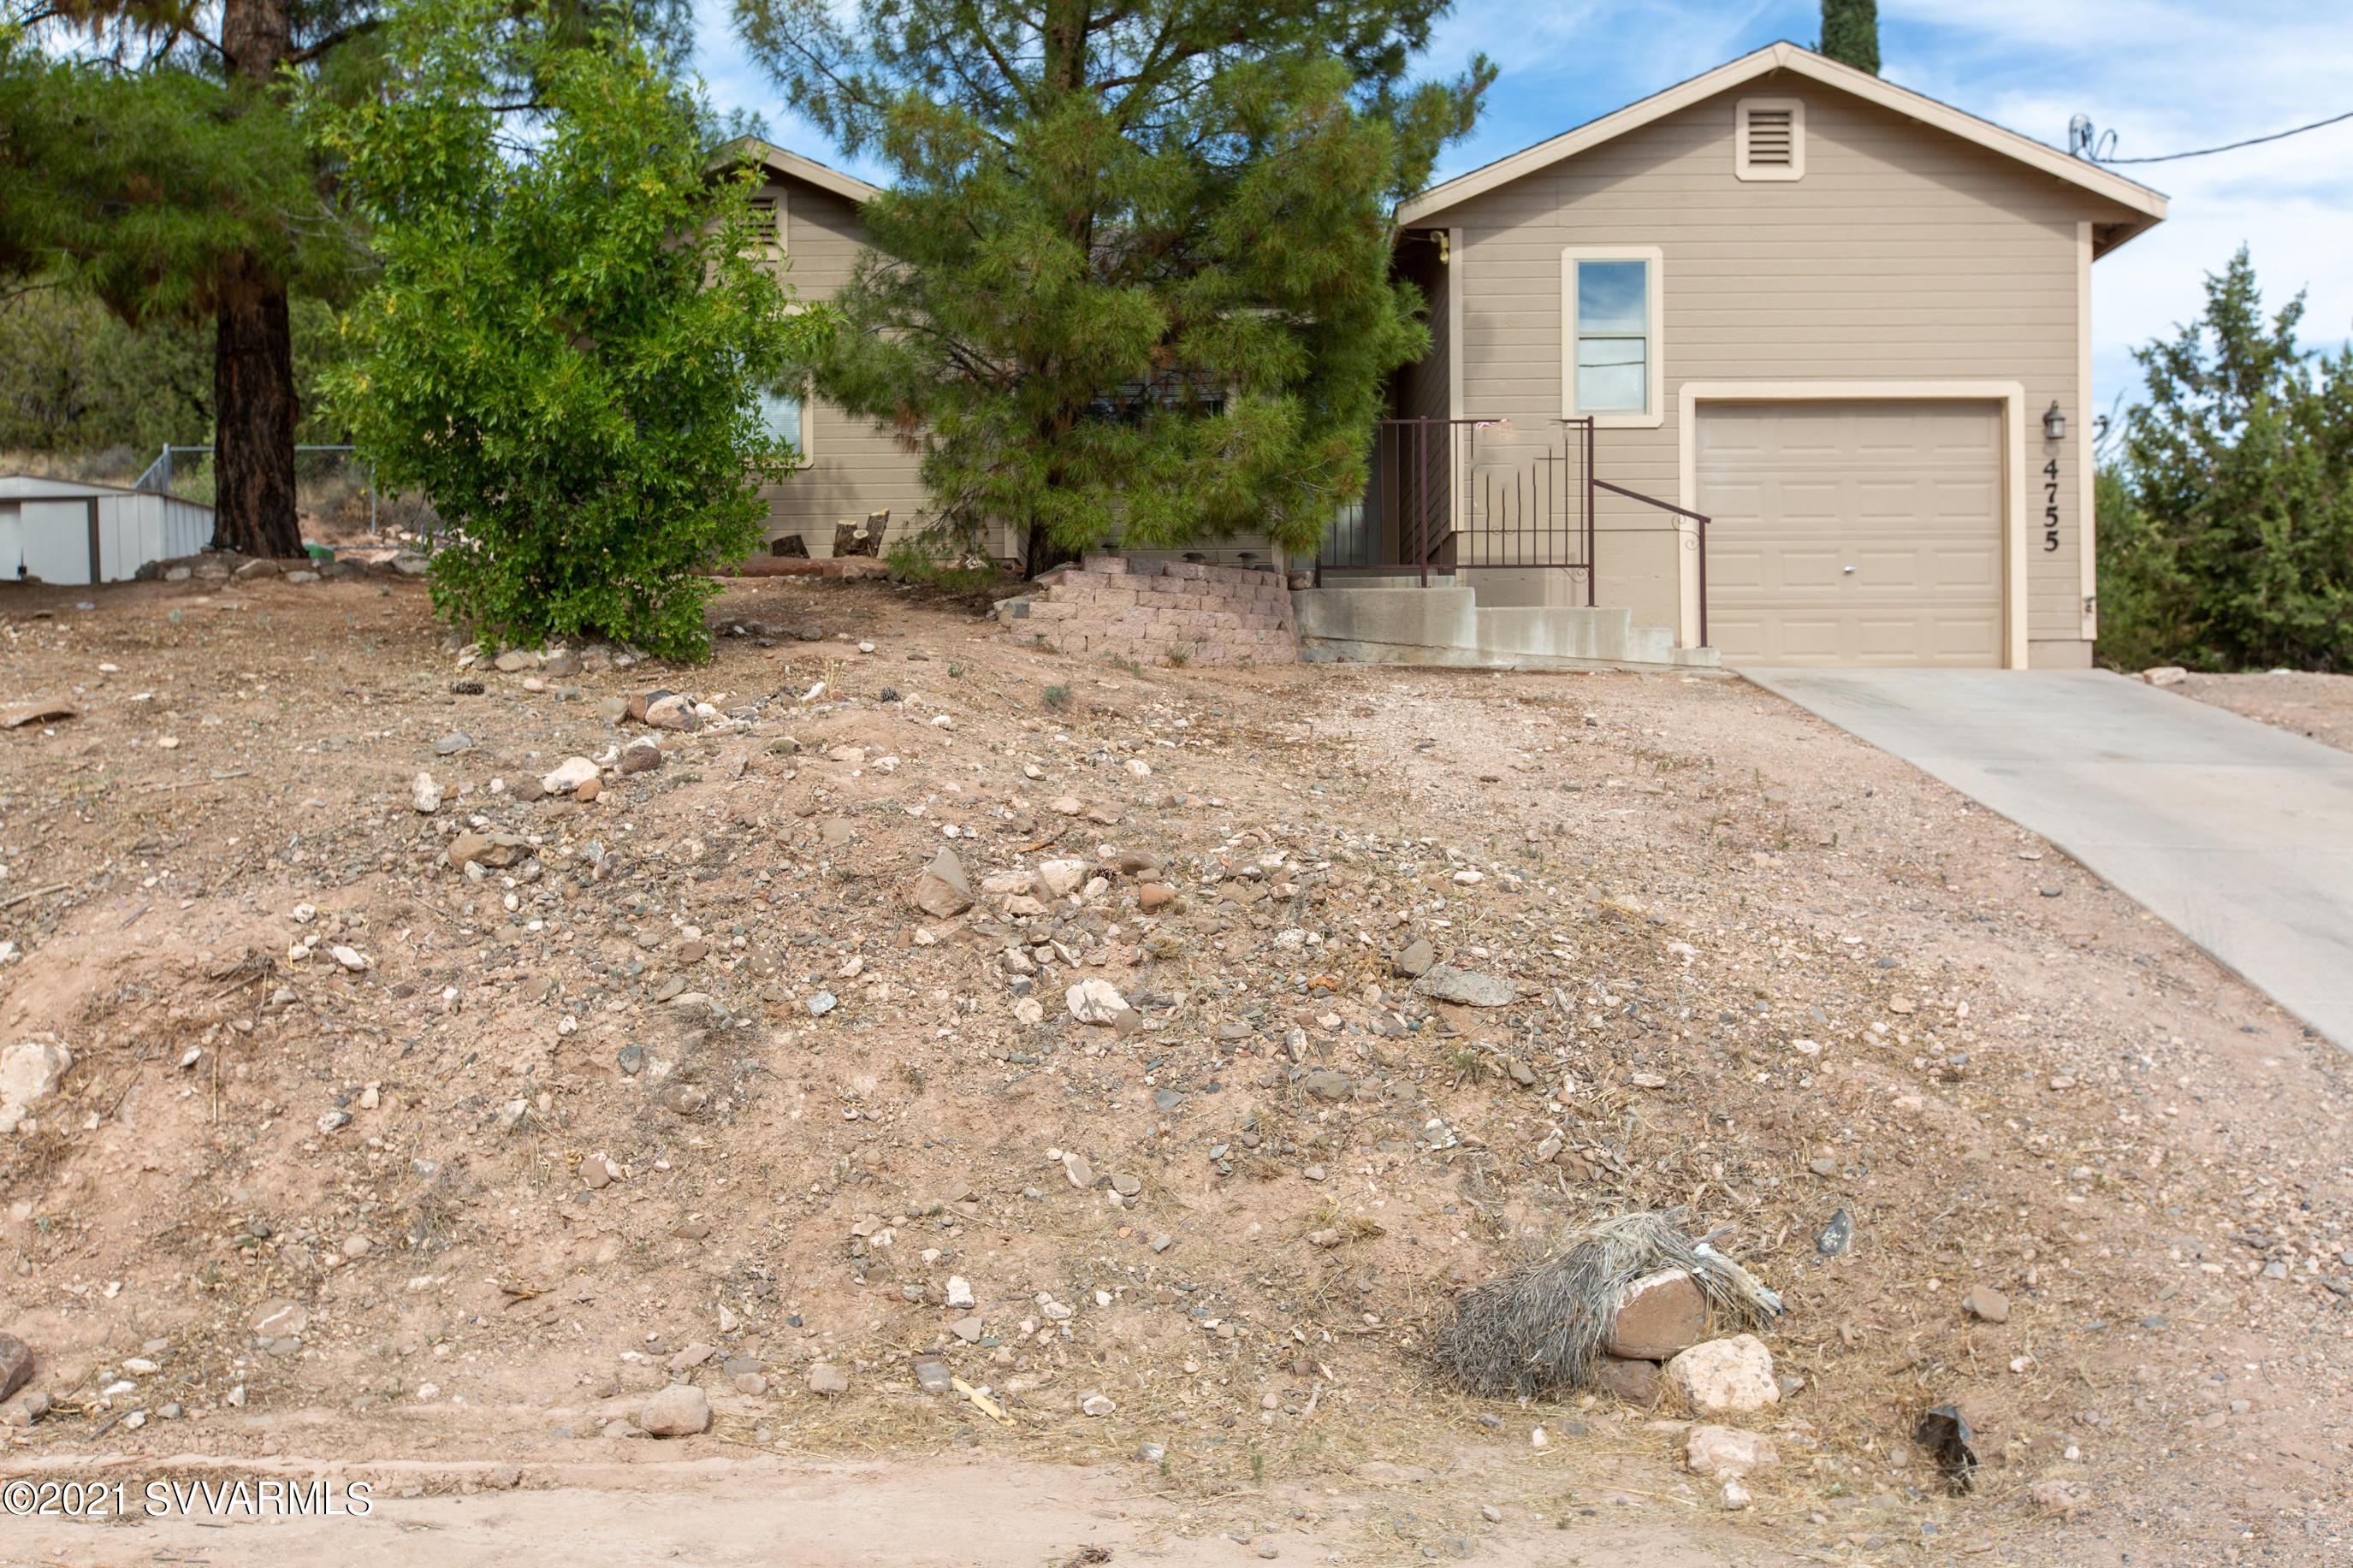 4755 N Gone Fishin Rd Rimrock, AZ 86335